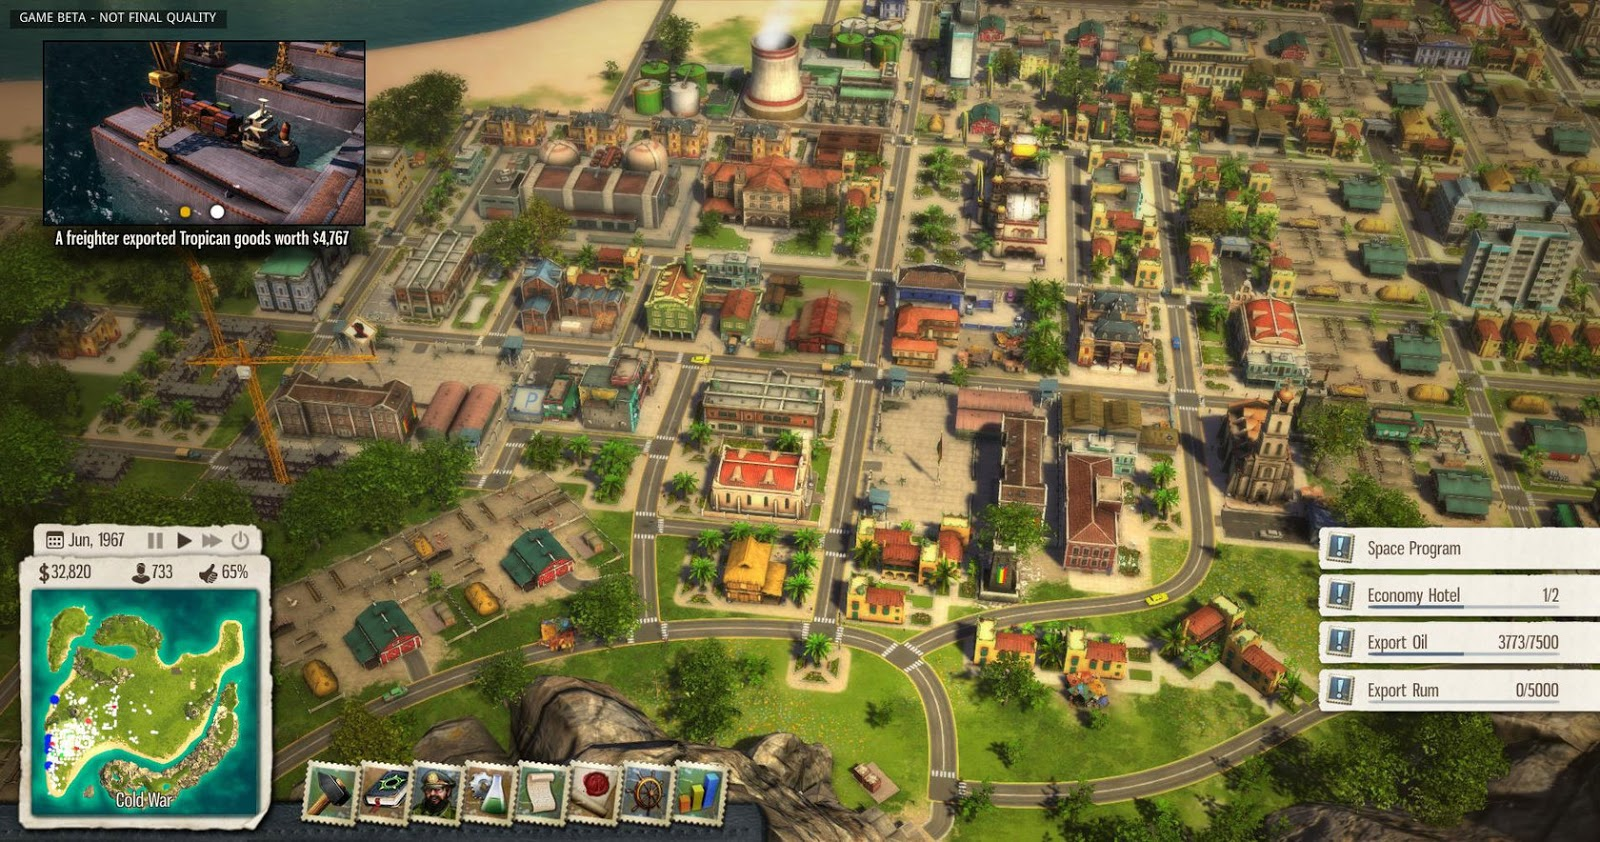 Tropico5 completecollection - Tropico 5 Complete Collection PC